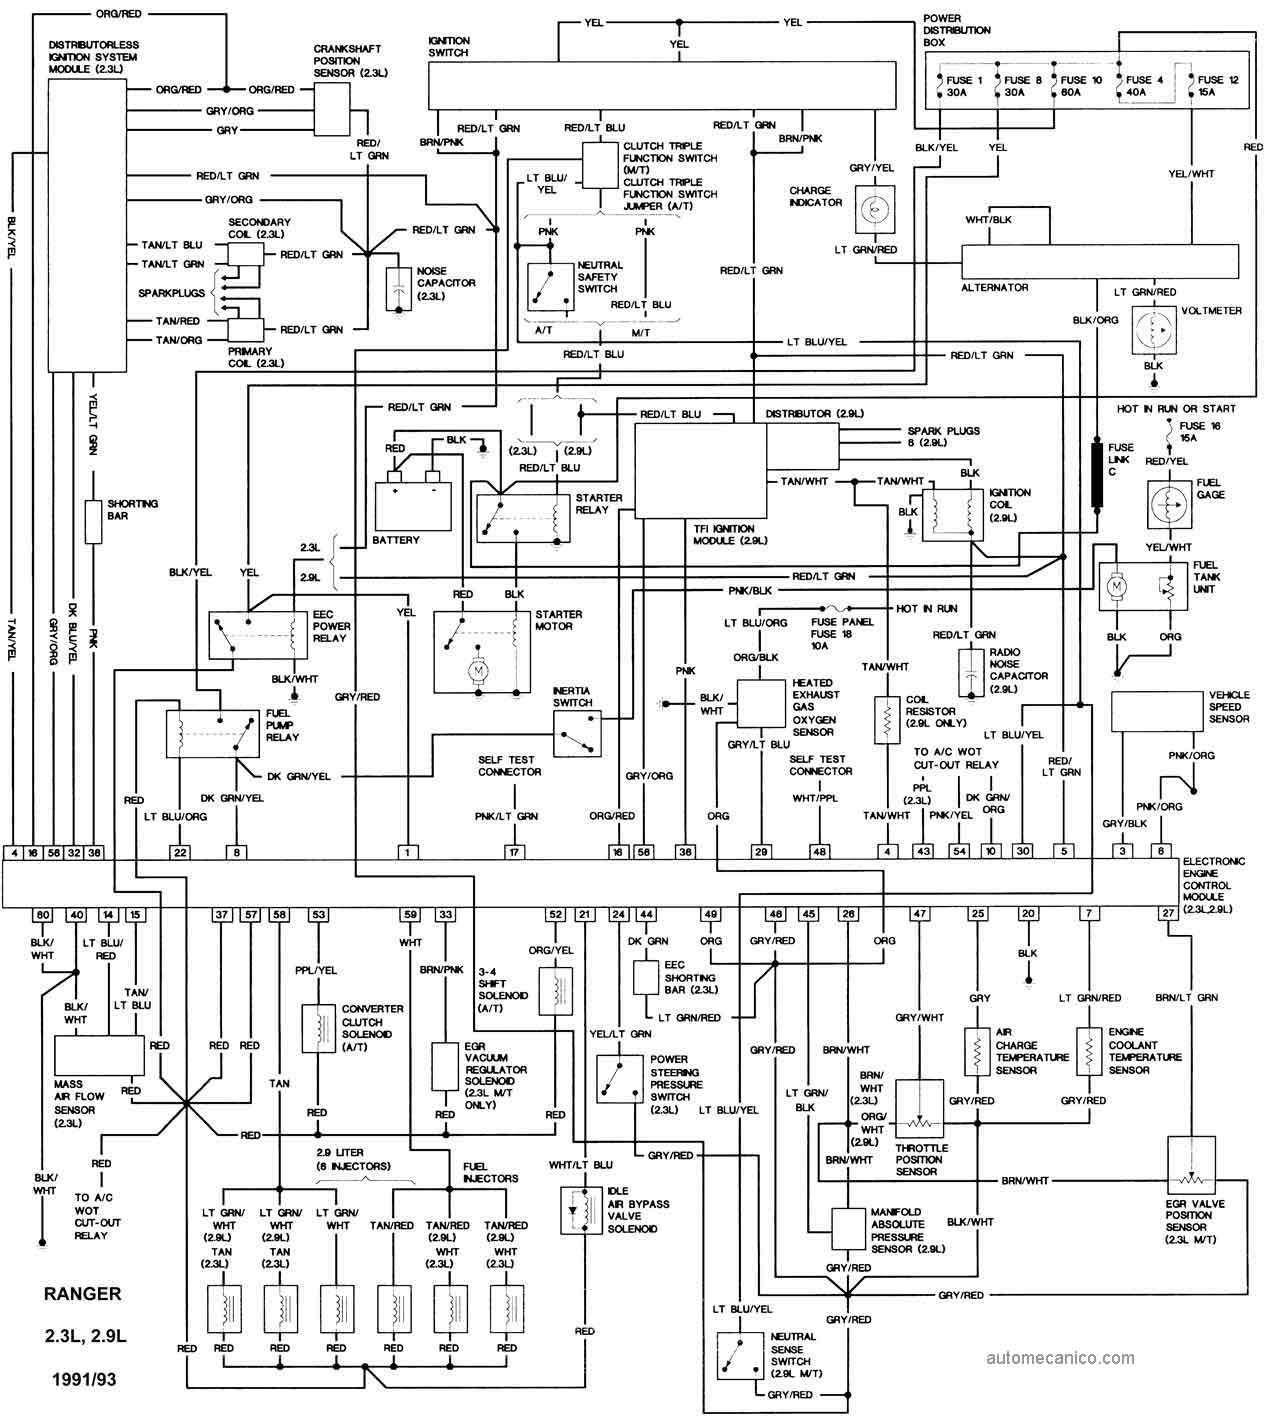 DZ_9713] 93 Ford Ranger Fuse Box Wiring Diagram Photos For Help Your WorkingNnigh Waro Usnes Cajos Mohammedshrine Librar Wiring 101